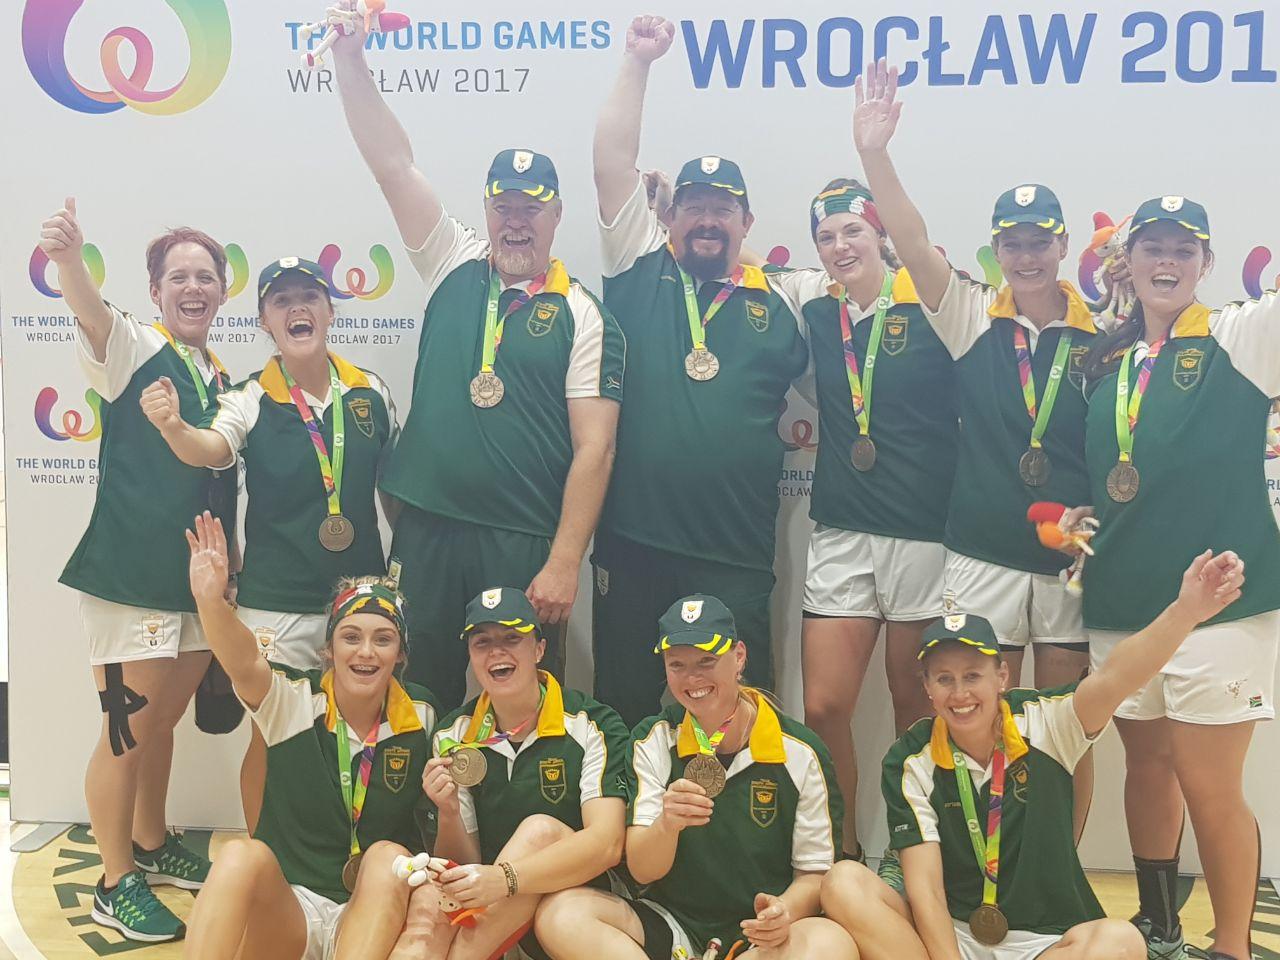 Tug-of-war team win SA's only medal at 2017 World Games